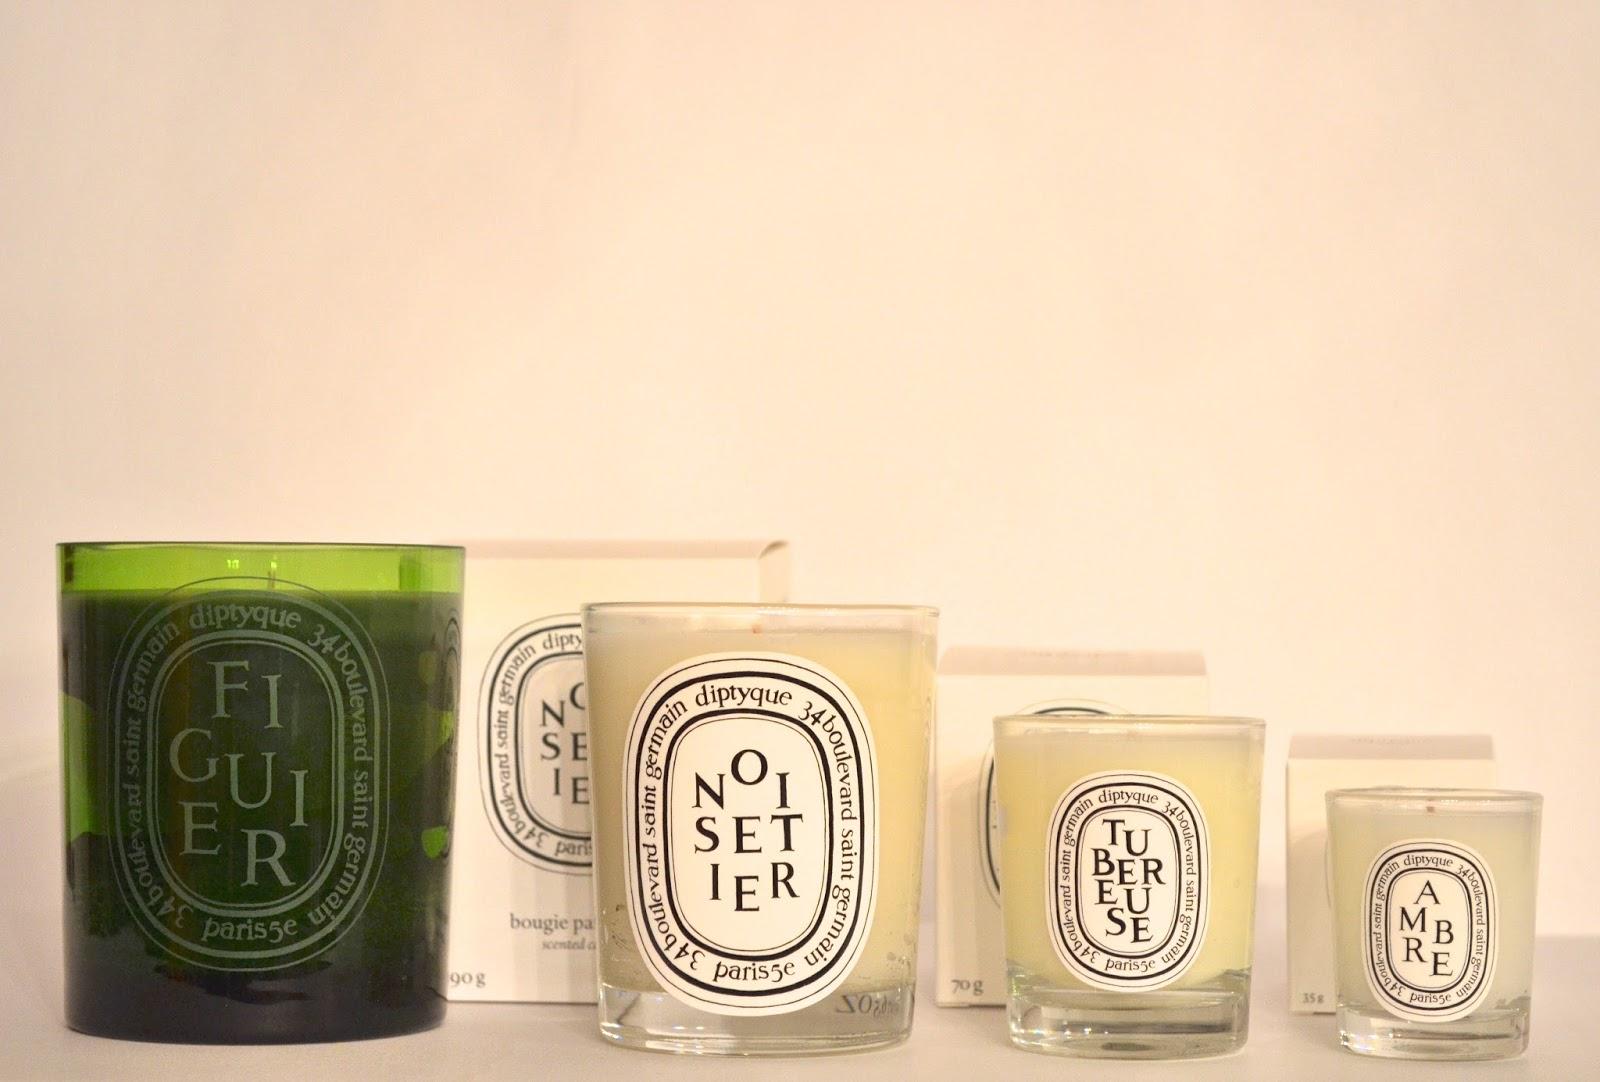 Diptyque Candles Figuier, Noisetier, Tubereuse, Ambre & Baies ...